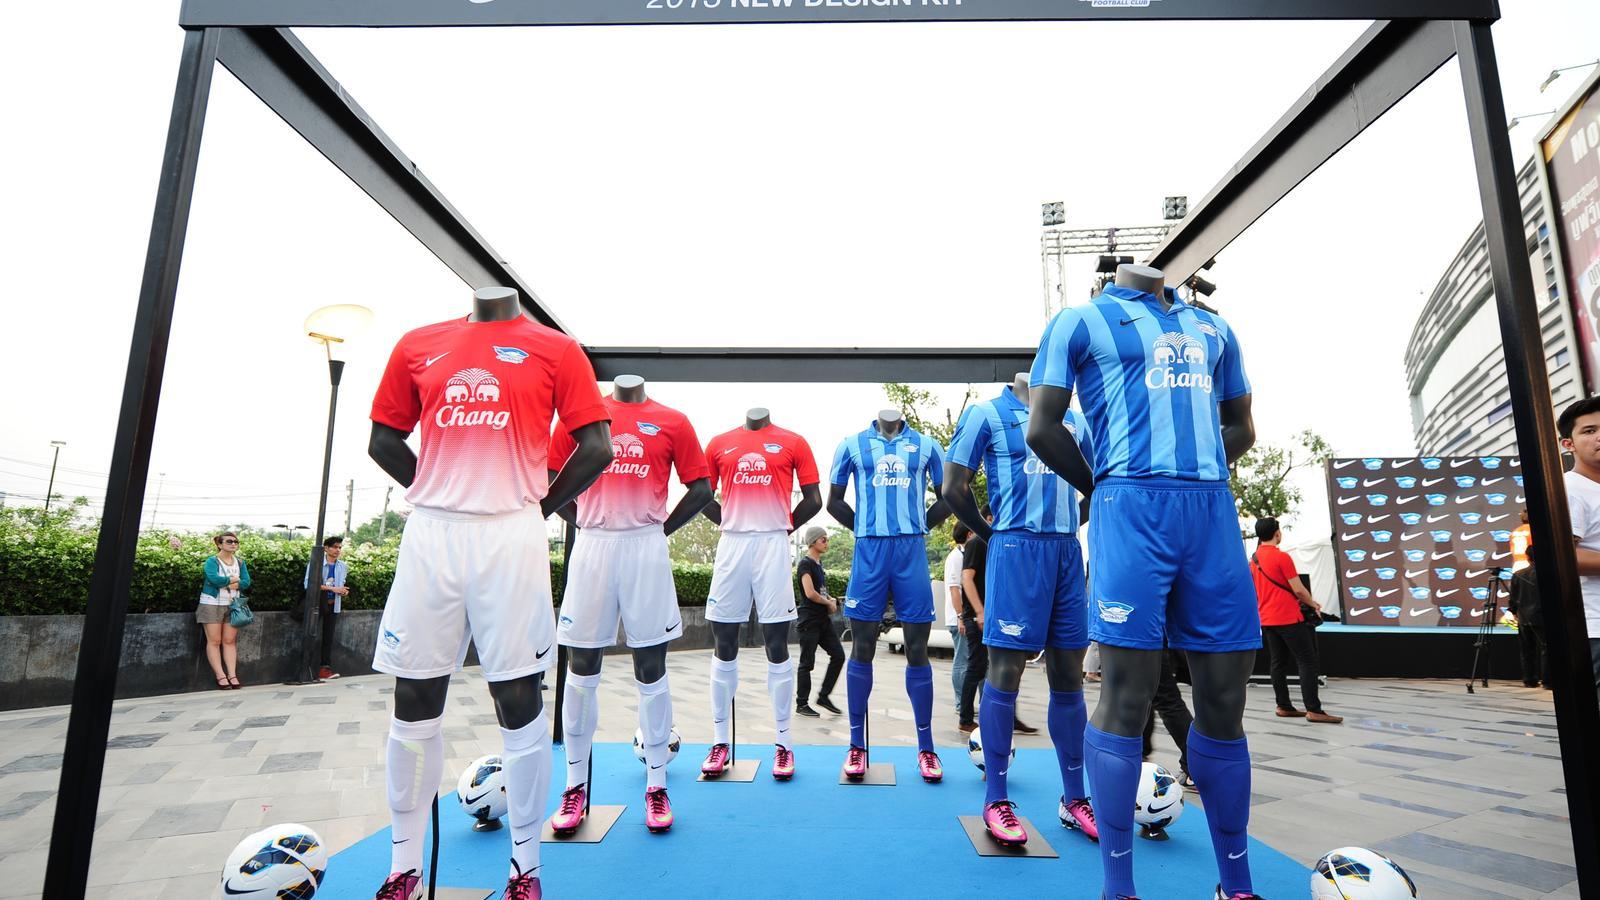 Chonburi FC Club Kits 2013/2014 AWAY and HOME